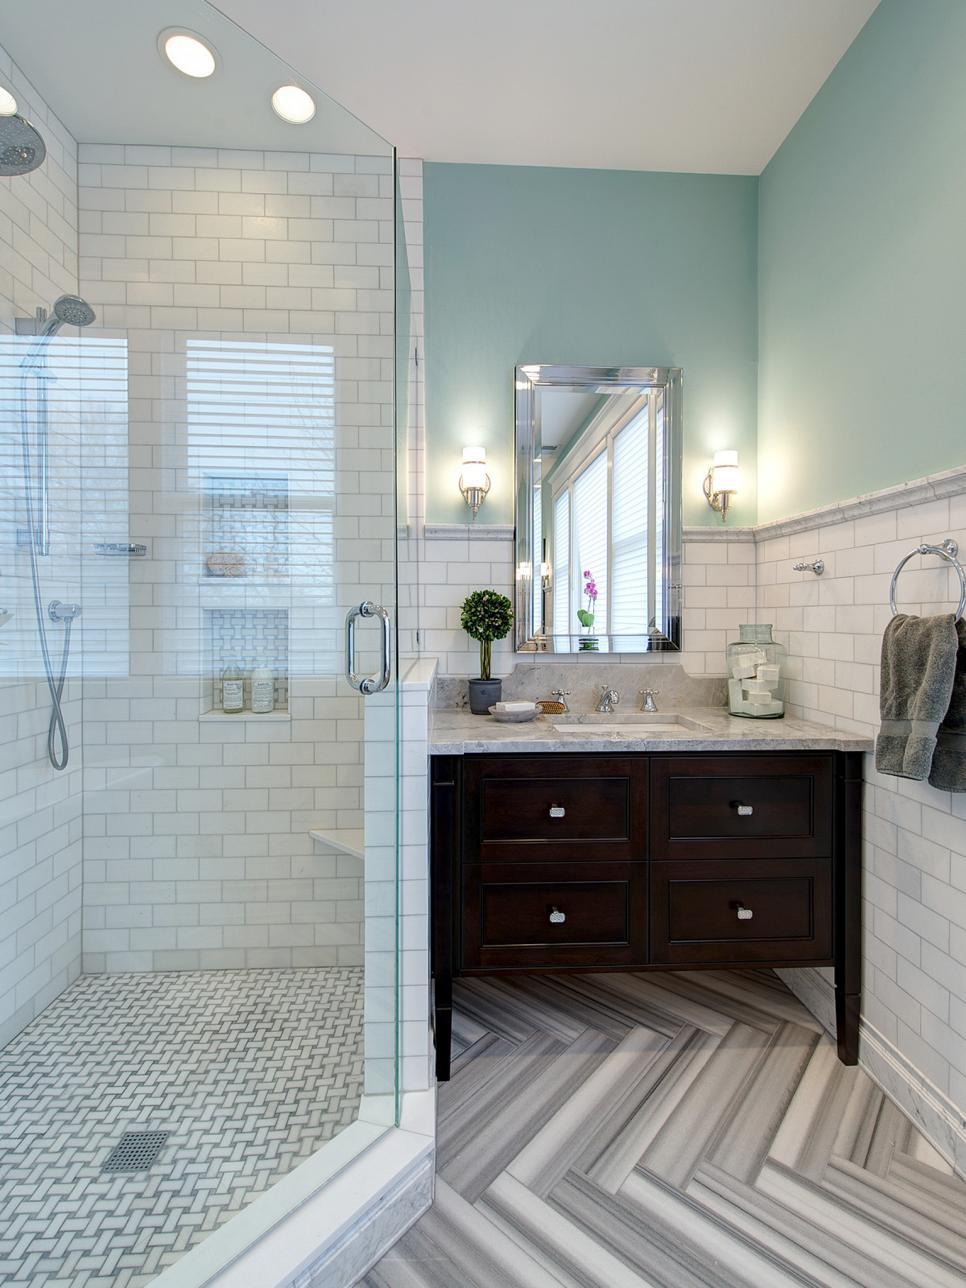 Bathroom gets elegant eclectic remodel joni spear hgtv for Hgtv bathrooms